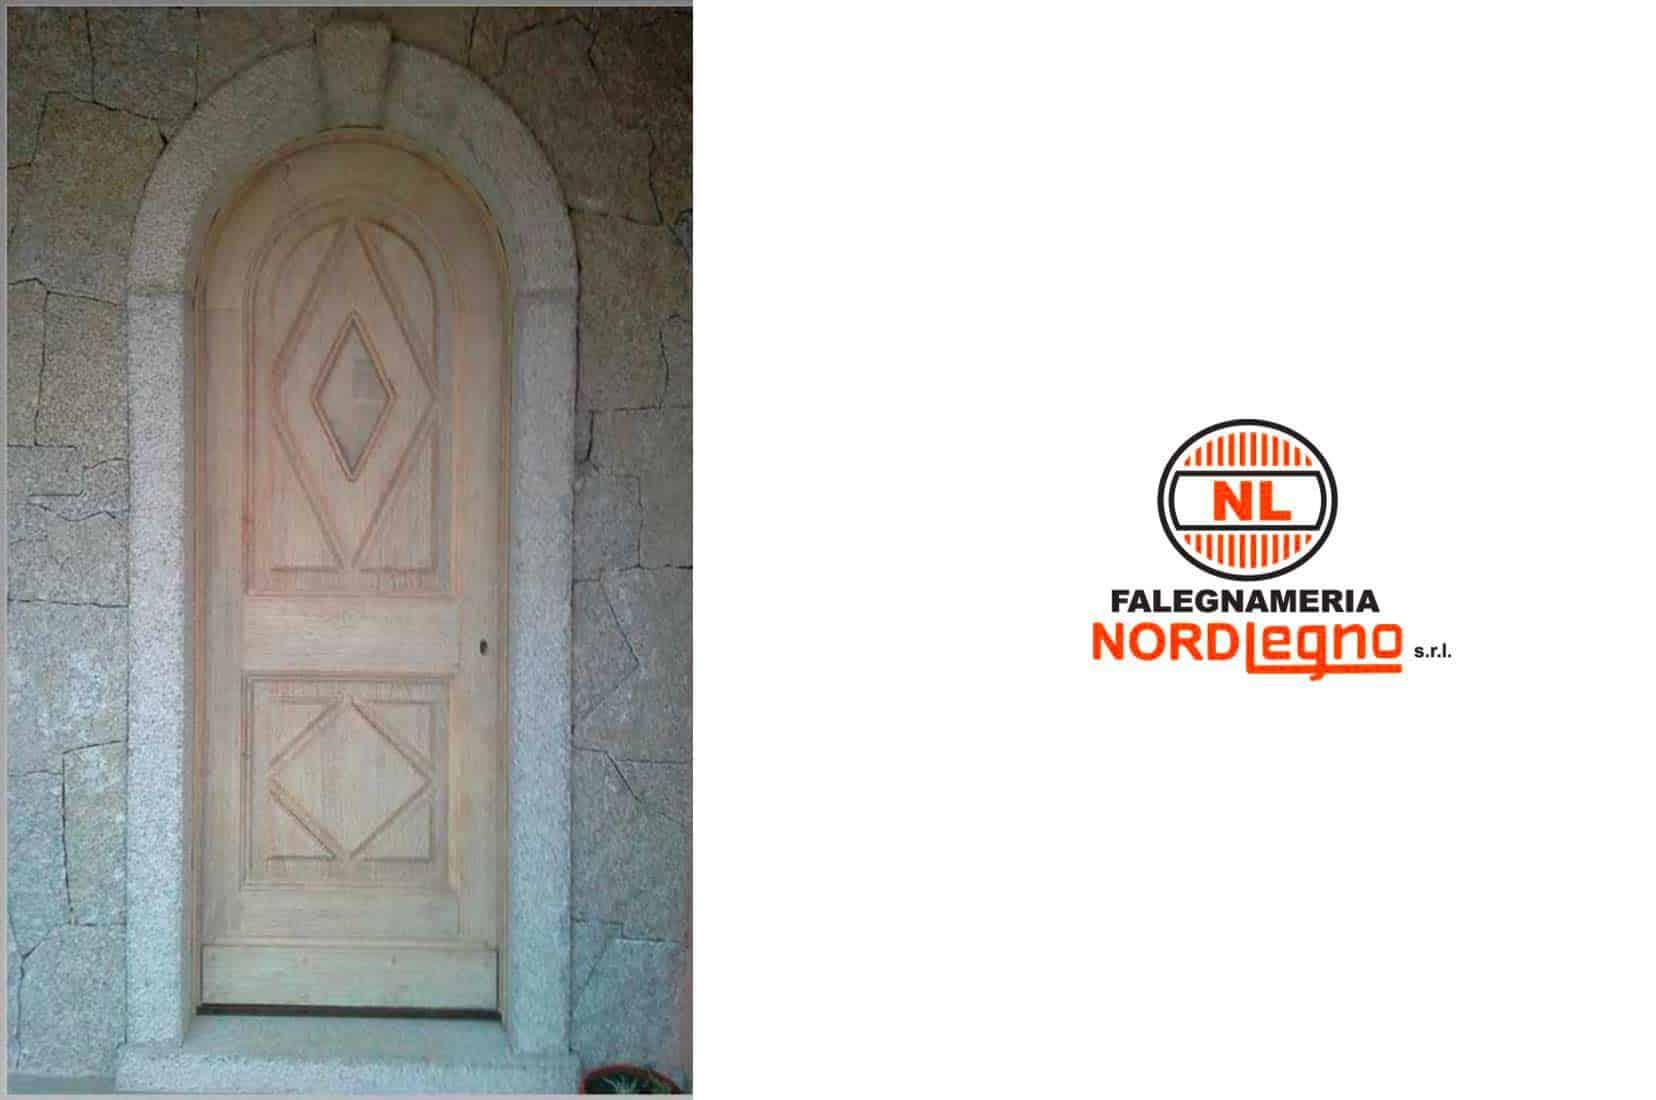 Falegnameria-calangianus-nord-legno-infissi-esterni-portone-legno-3.jpg